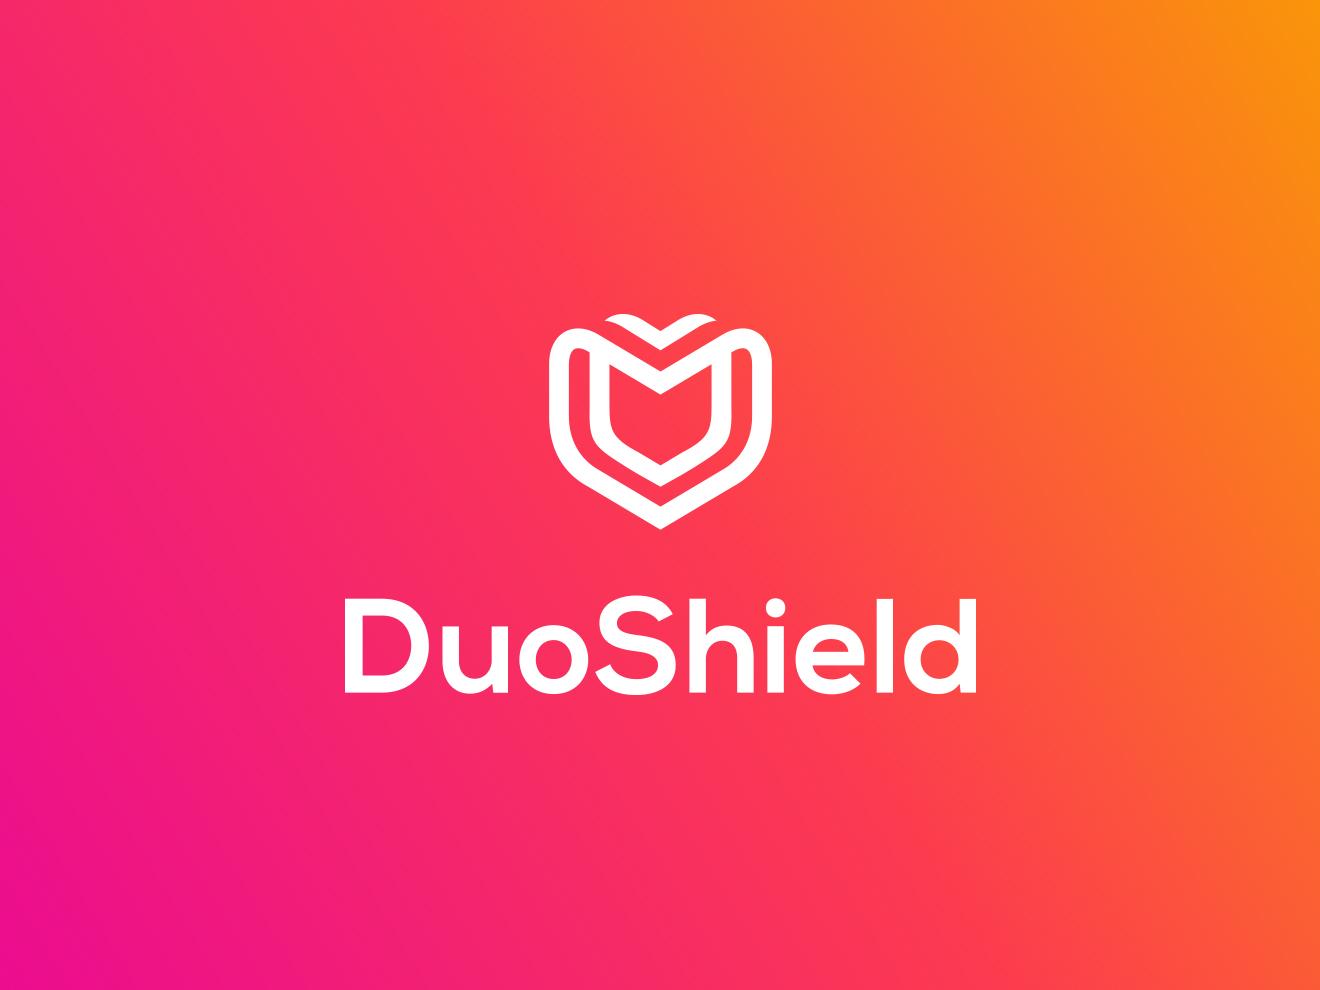 Duoshield Logo Design ui design ux visual identity icon modern creative payment finance business ideas logotype logos logo animation rebrand brand brand identity branding